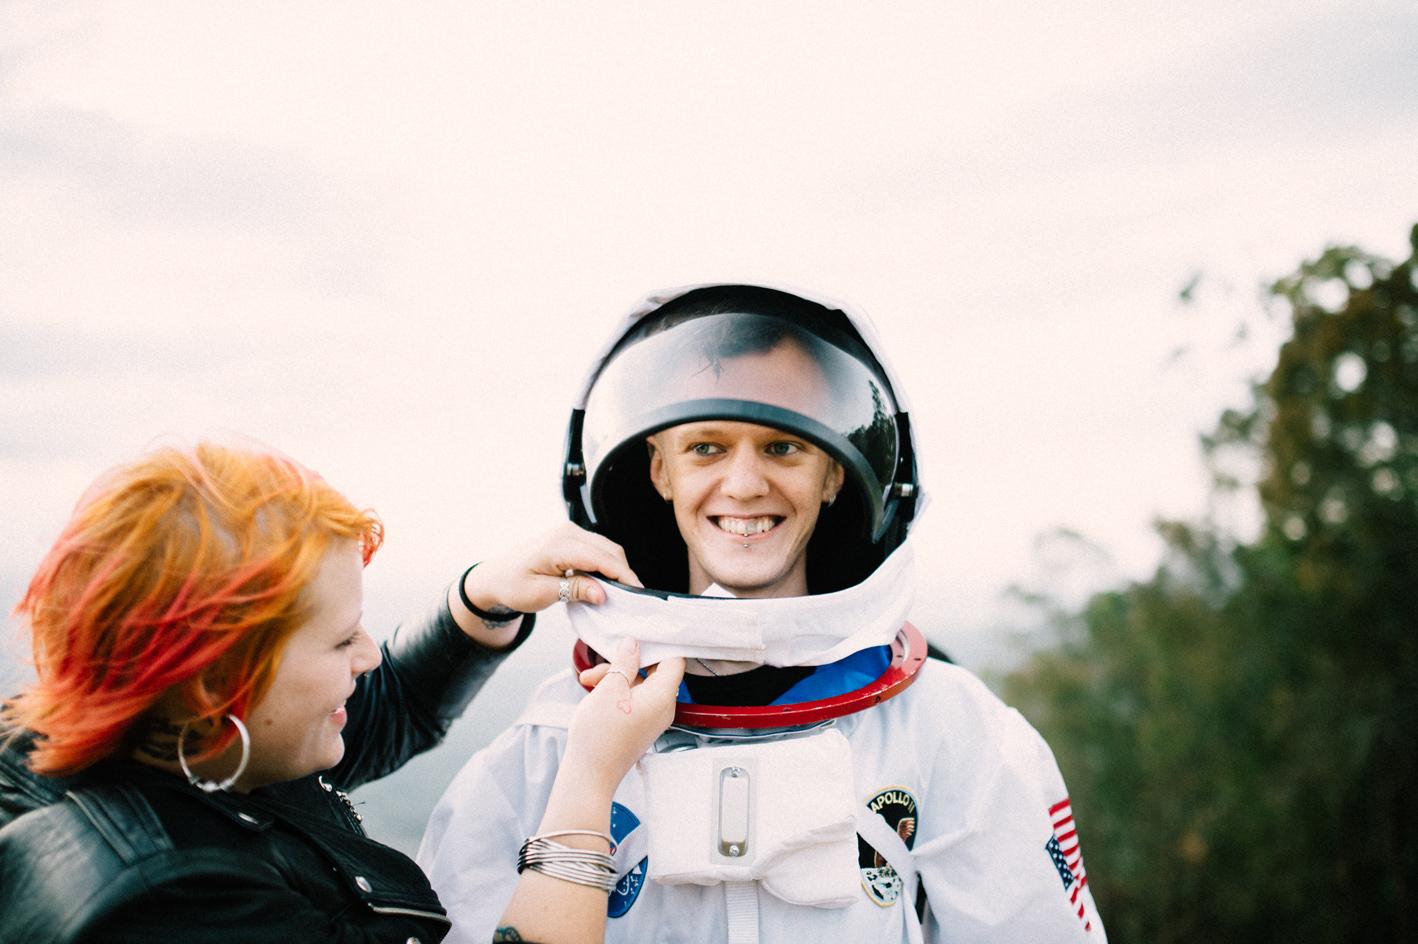 033-astronaut-amy-craig-mount-tamborine-sophie-baker-photography